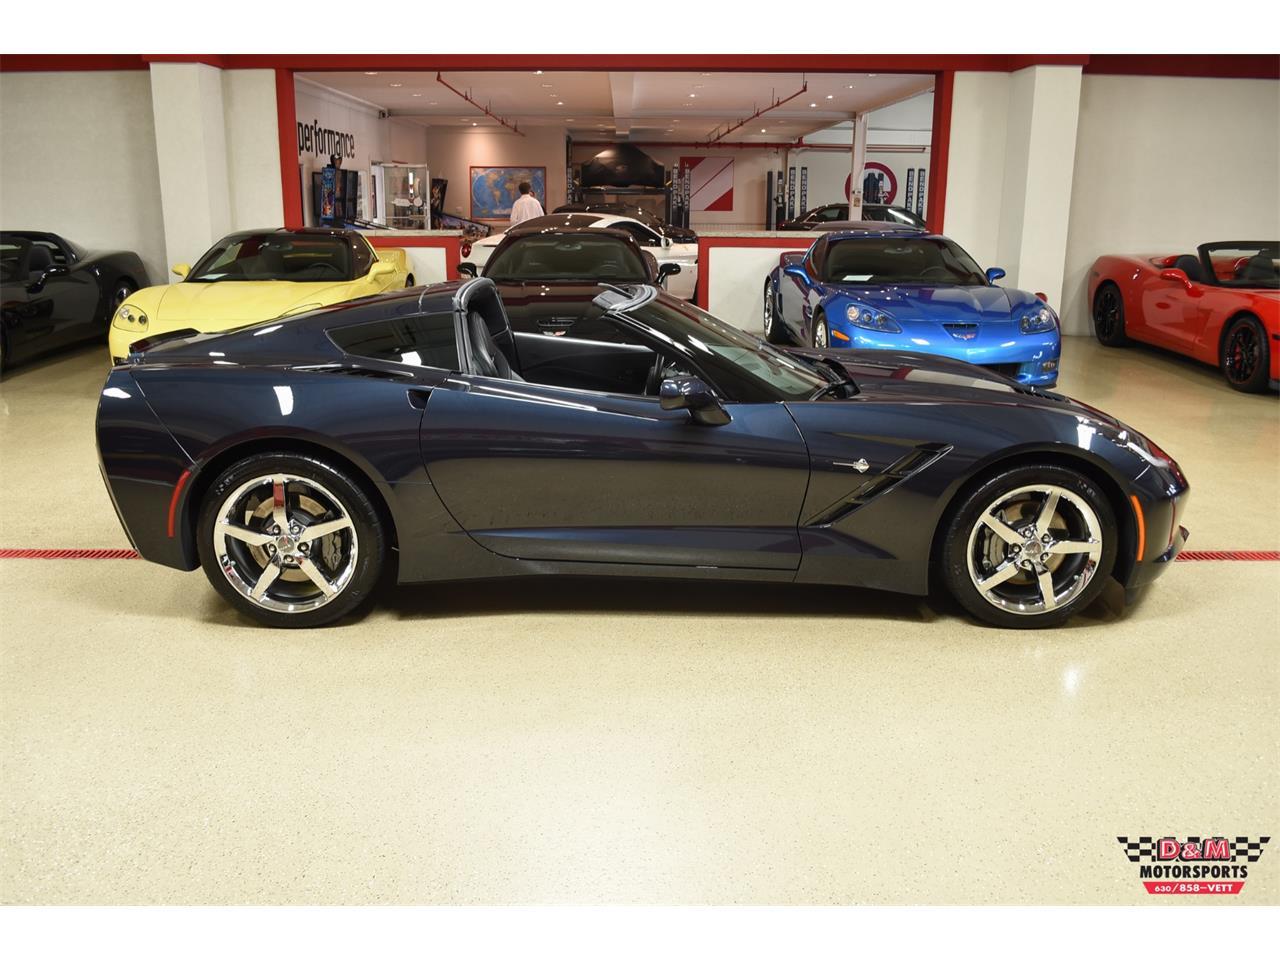 Large Picture of '15 Chevrolet Corvette located in Glen Ellyn Illinois - $45,995.00 - QGAK